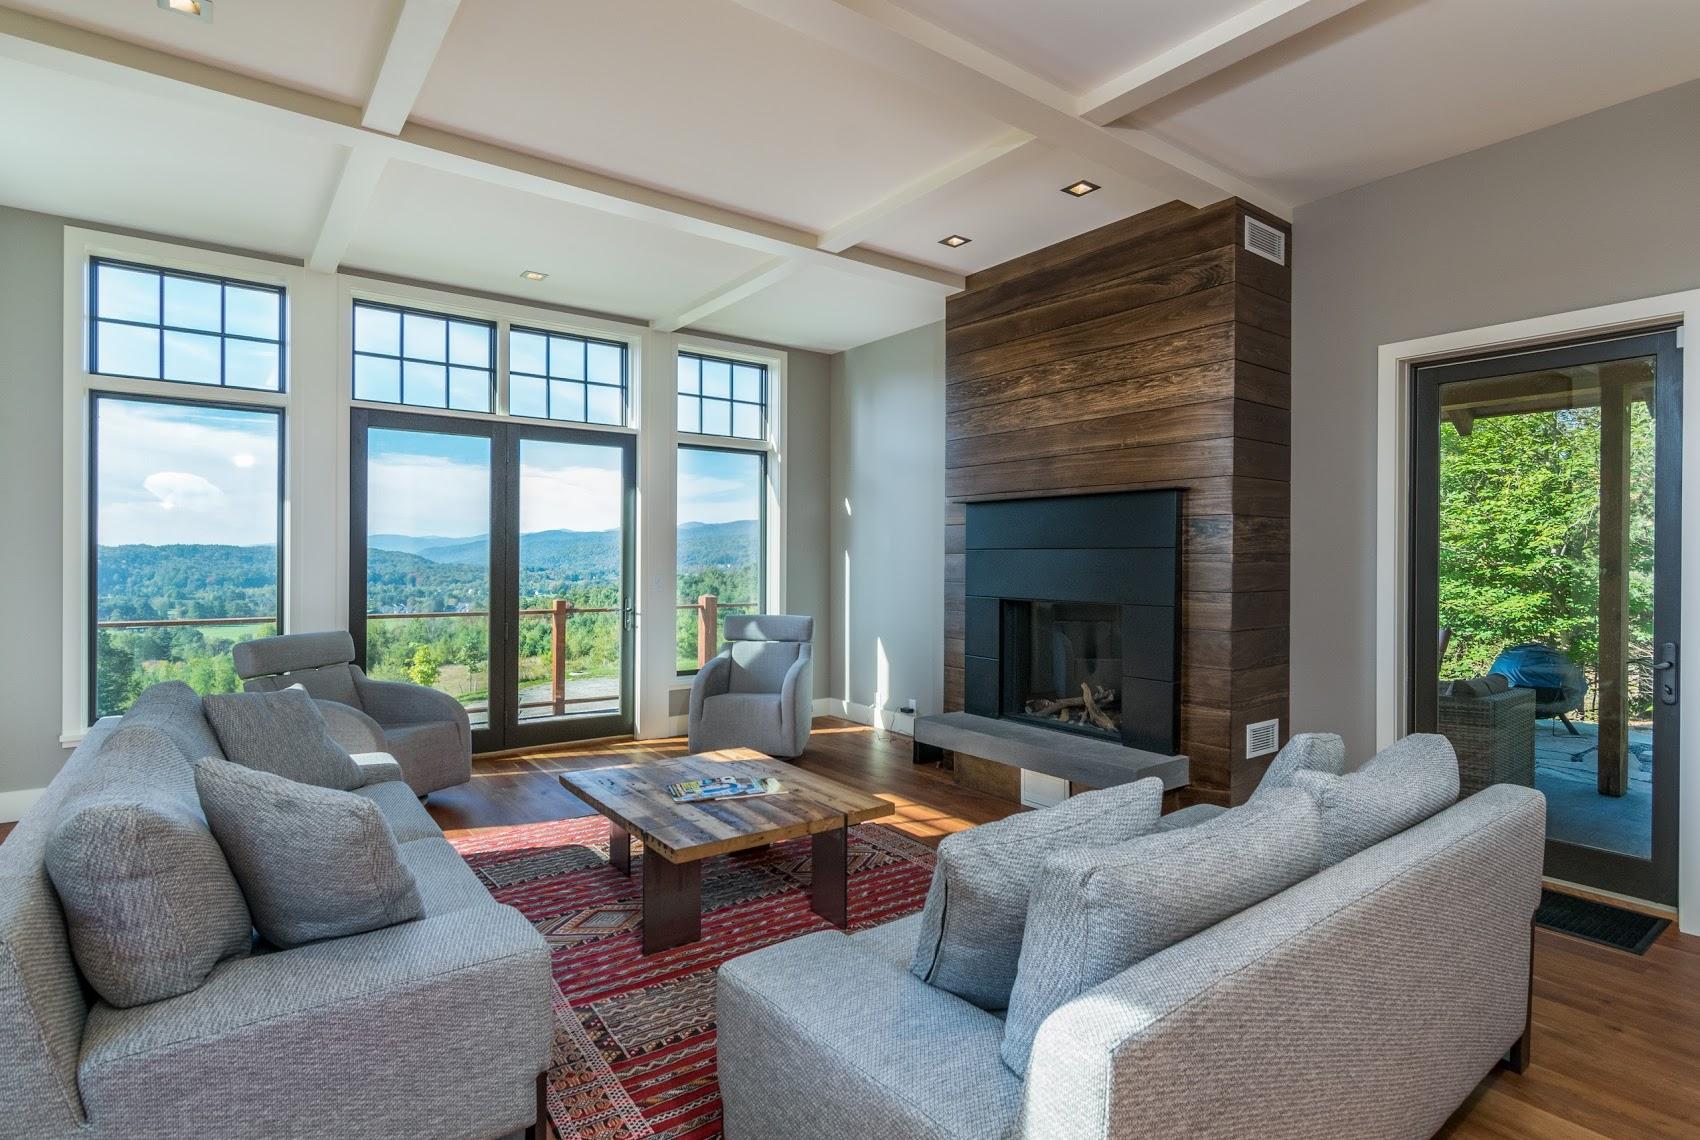 https://www.blackrockus.com/wp-content/uploads/2017/12/Living-Room-Fireplace.jpg